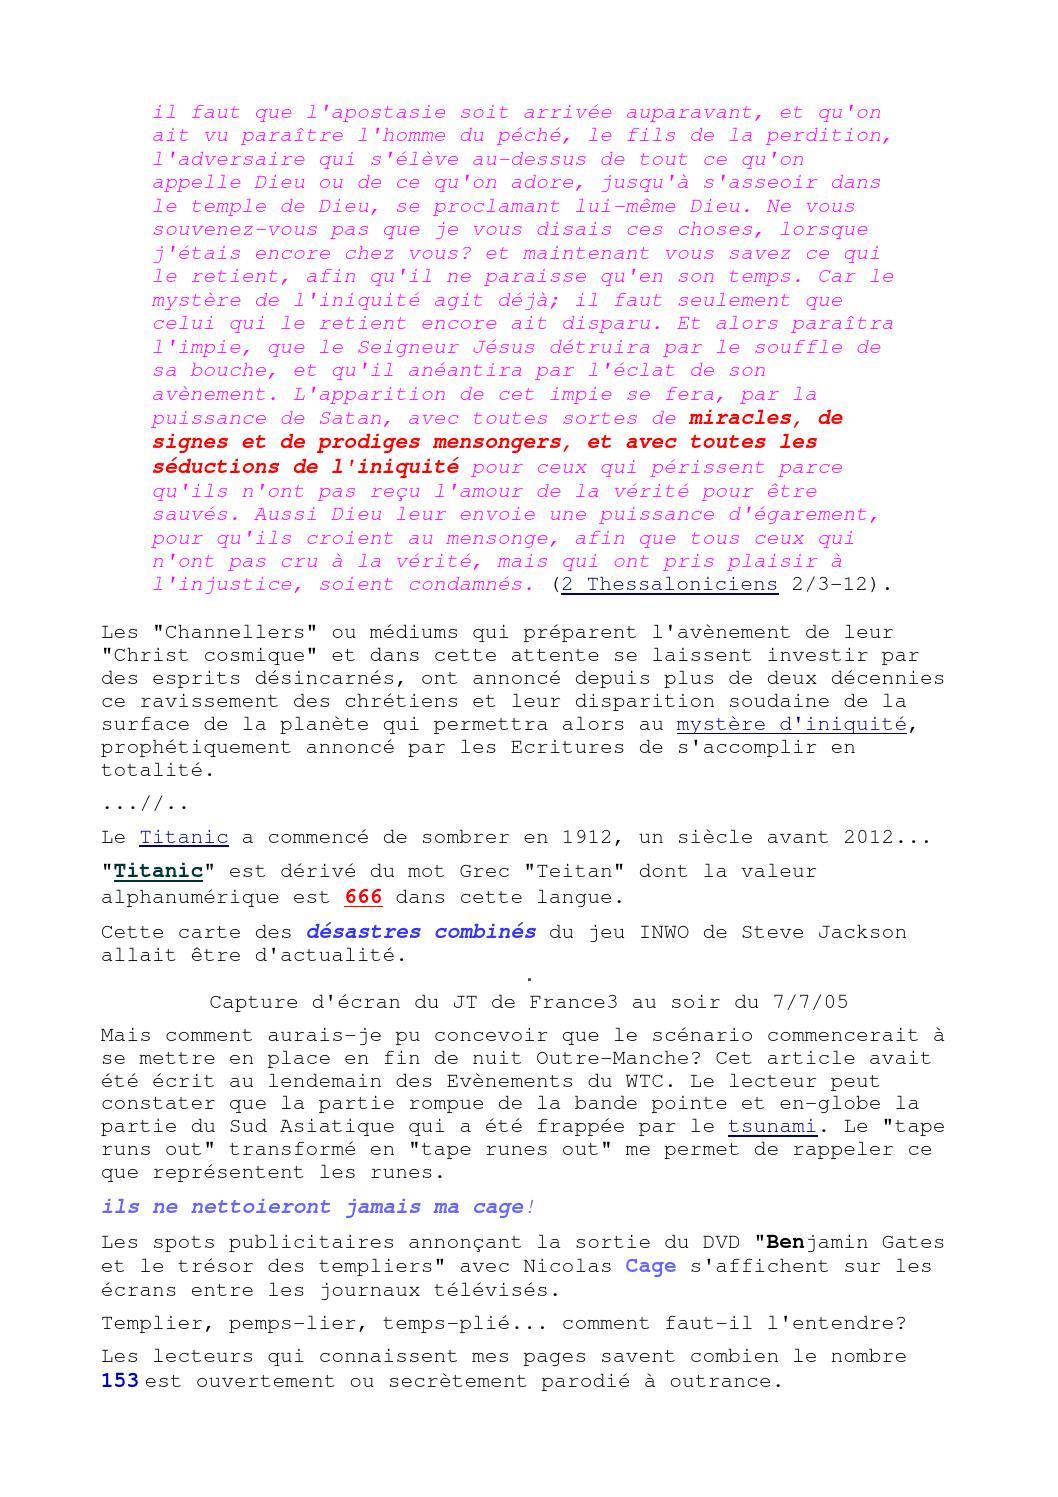 Numerologie Kabbale Et Autres Derives | Vebuka encequiconcerne Mot Mystere